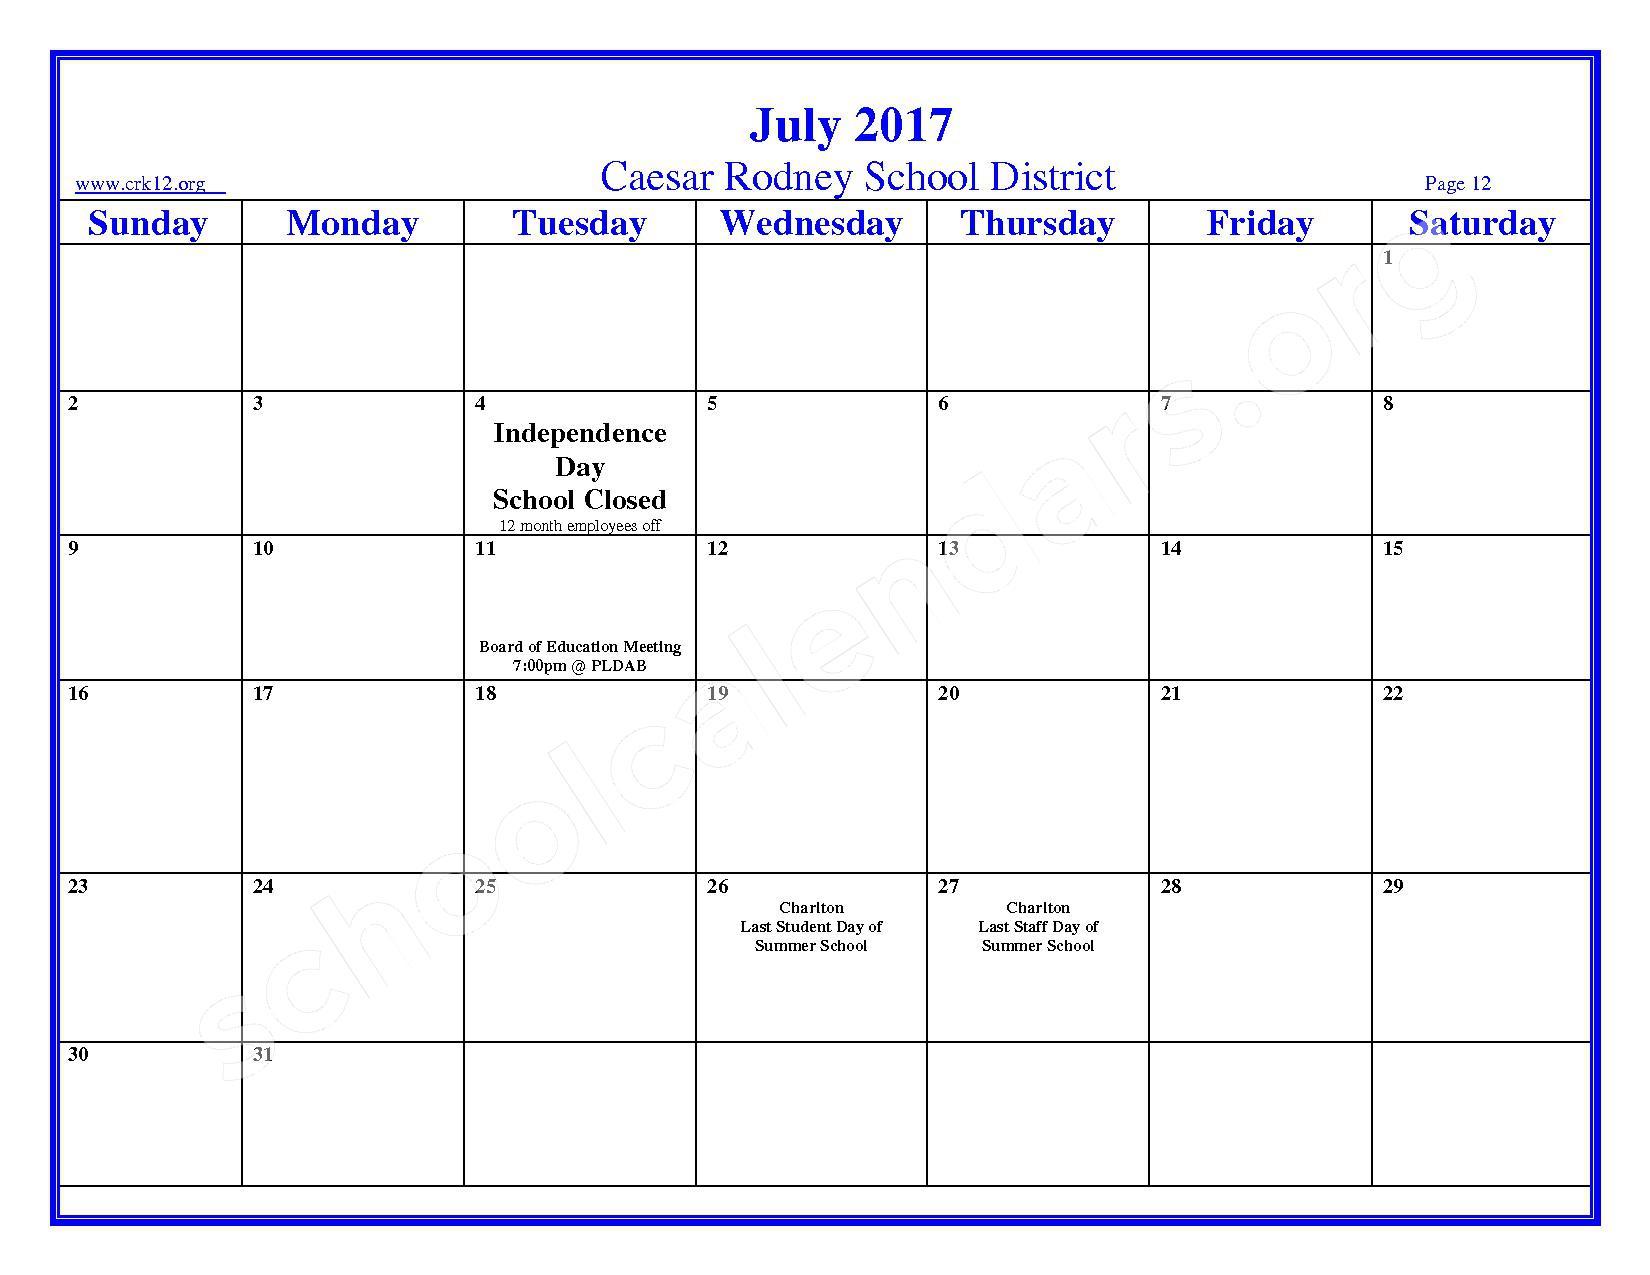 2016 - 2017 School Calendar – Brown (W. Reily) Elementary School – page 12